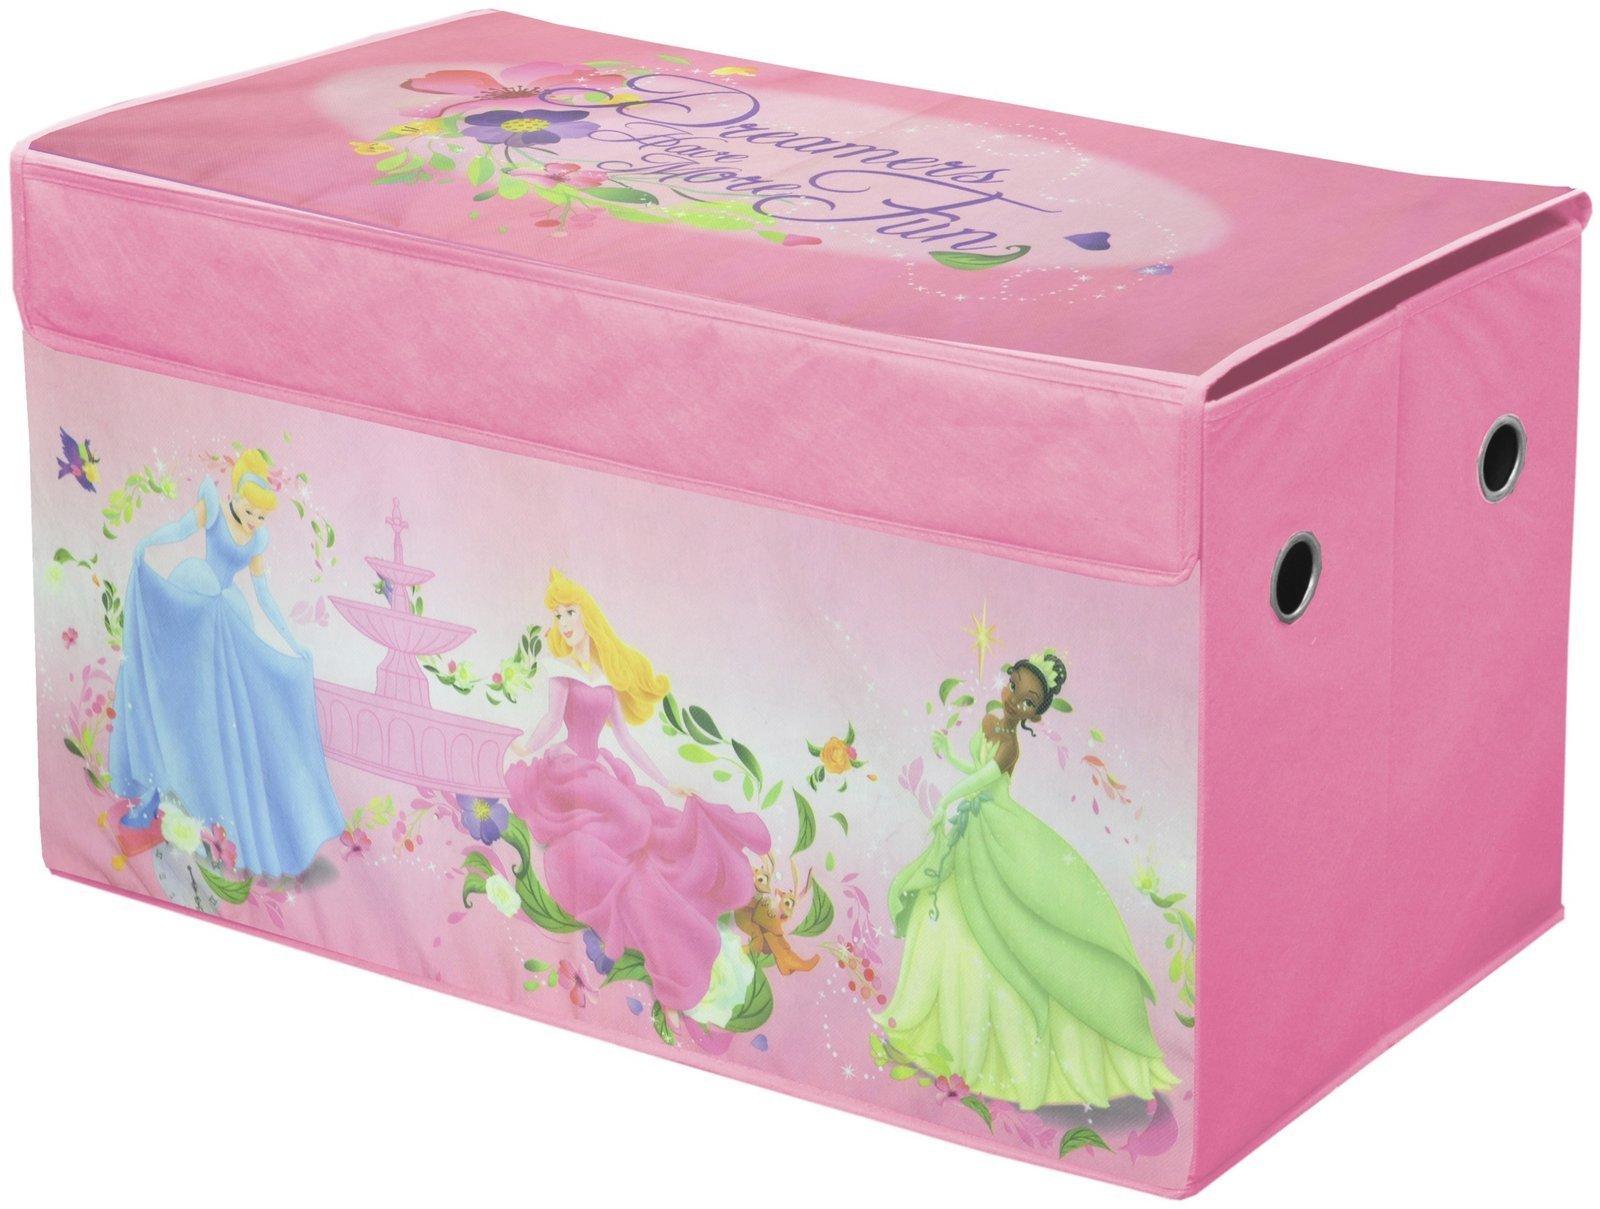 Disney Princess Collapsible Storage Trunk by Disney